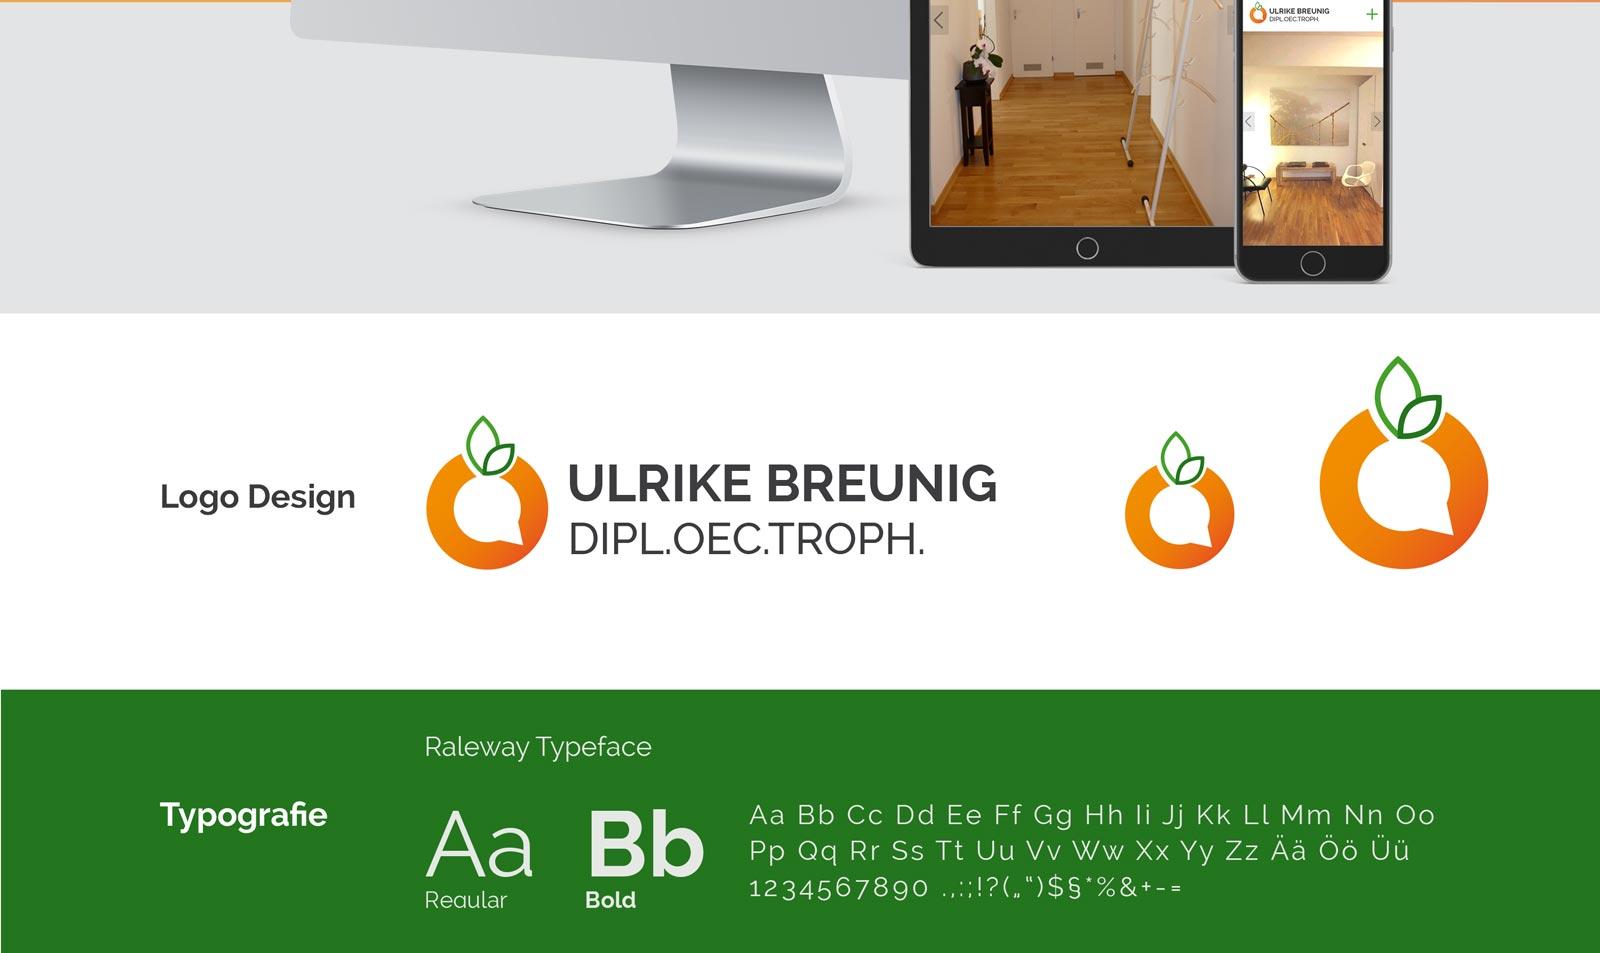 Breunig_Webdesign_Logo_Design_2.jpg